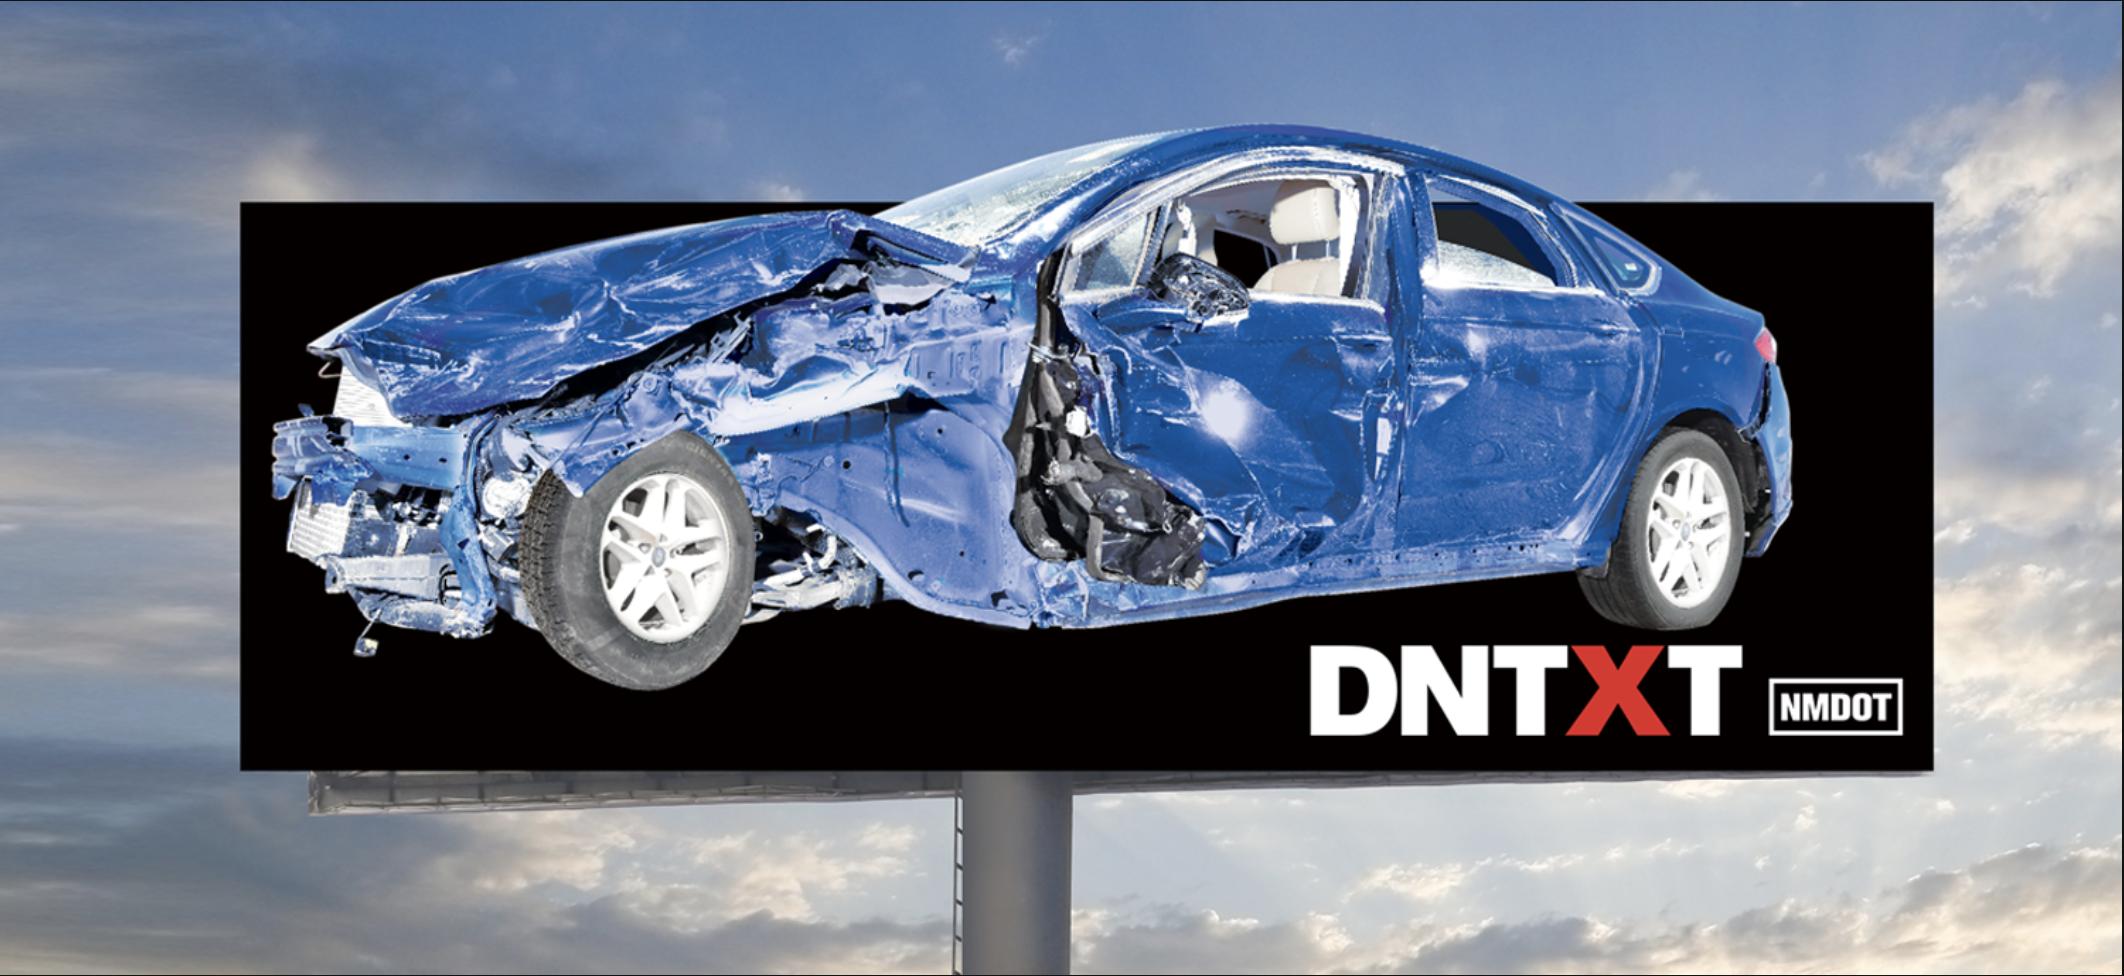 DNTXT Crash NMDOT